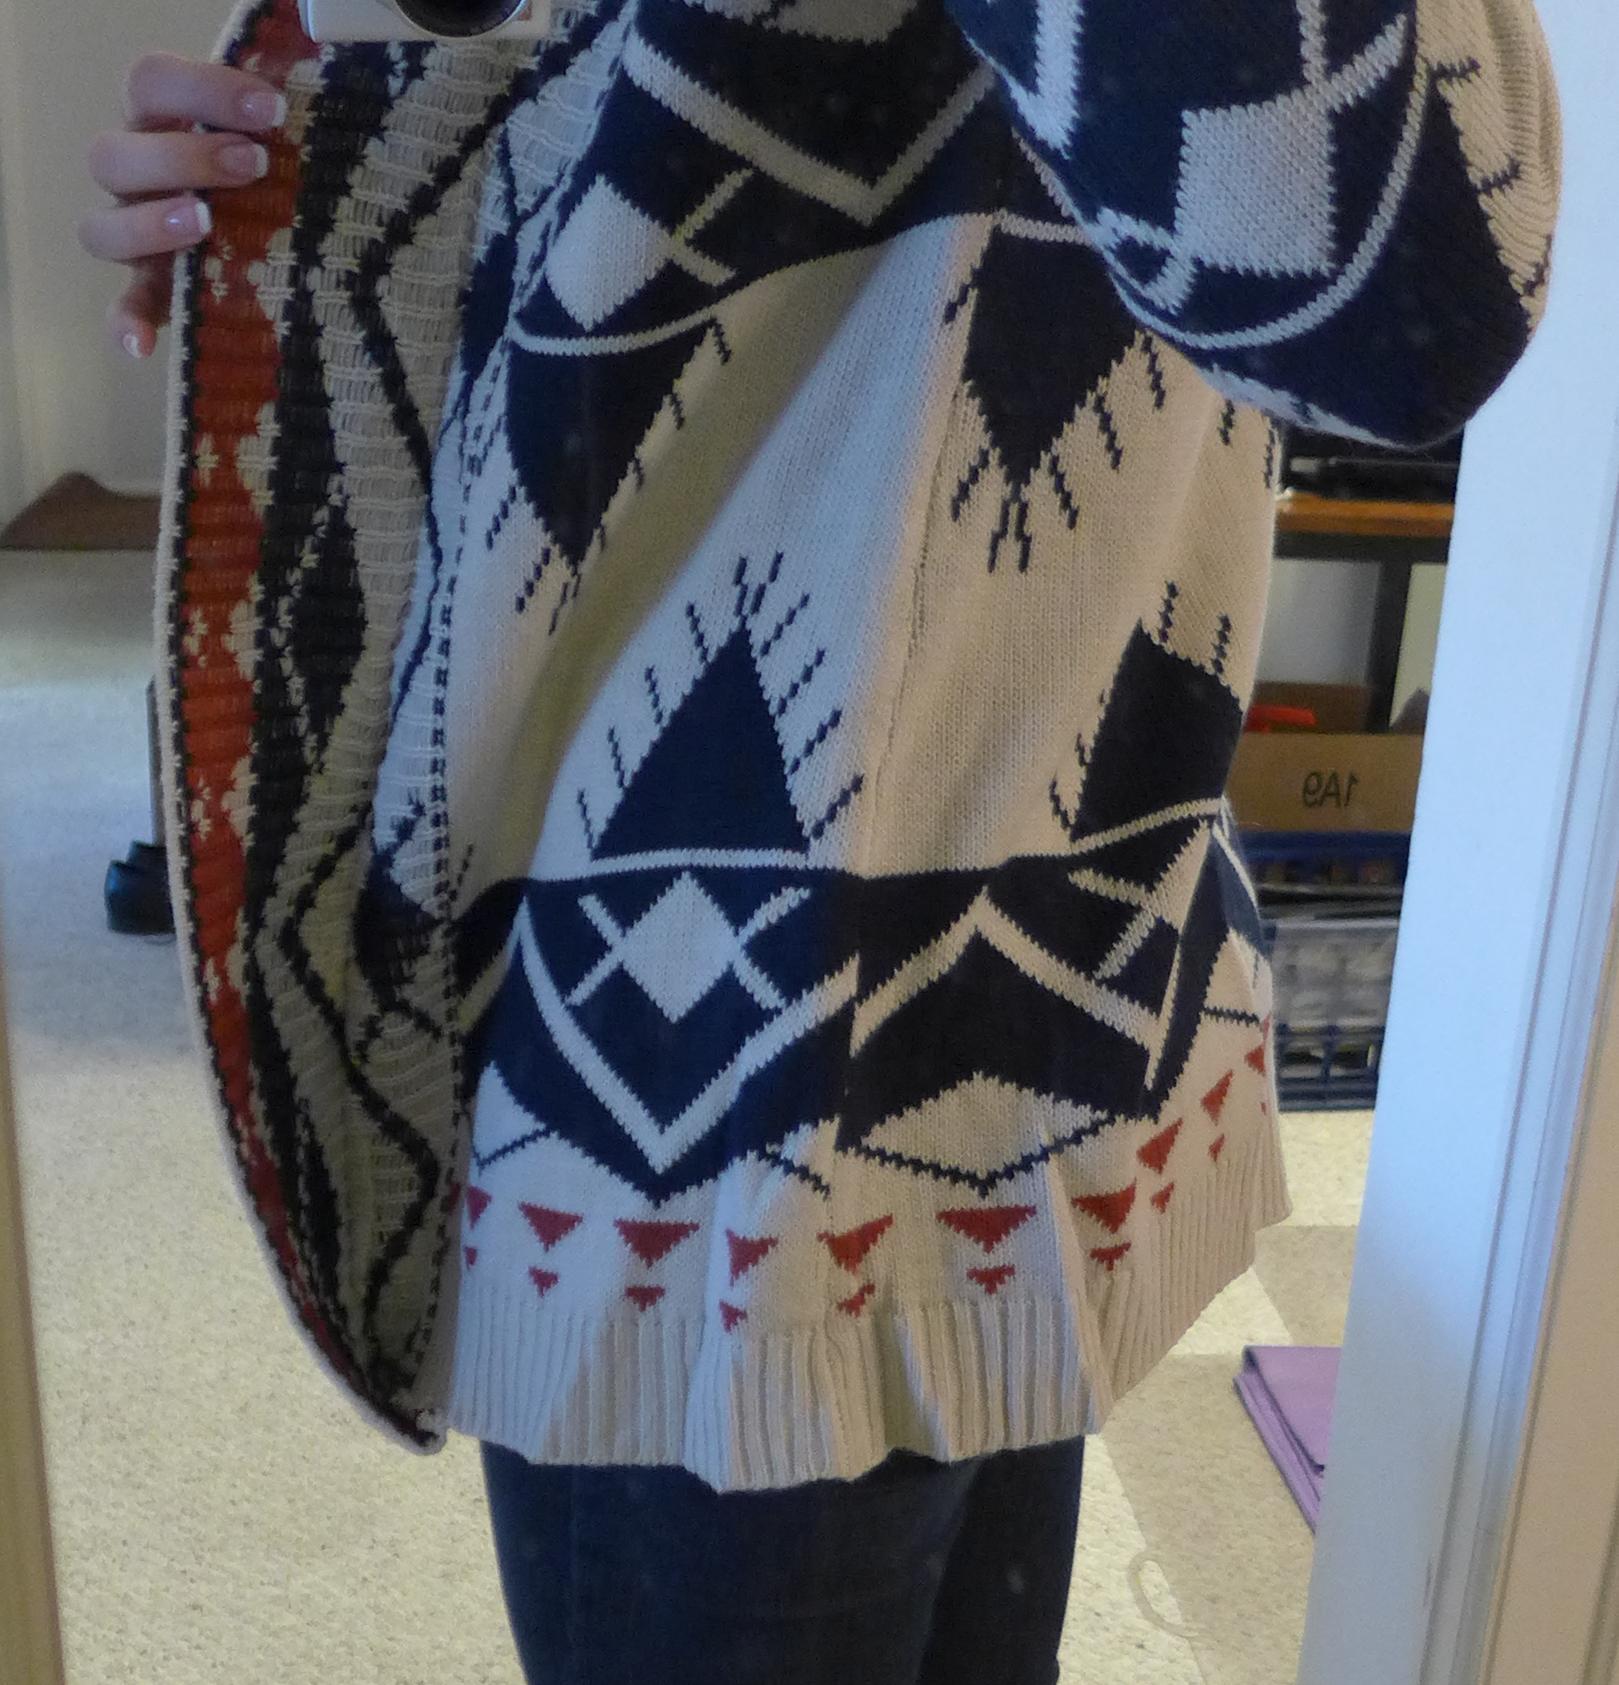 Fate Garvey Tribal Print Open Front Cardigan - Monika wearing detailed side view - Stitch Fix